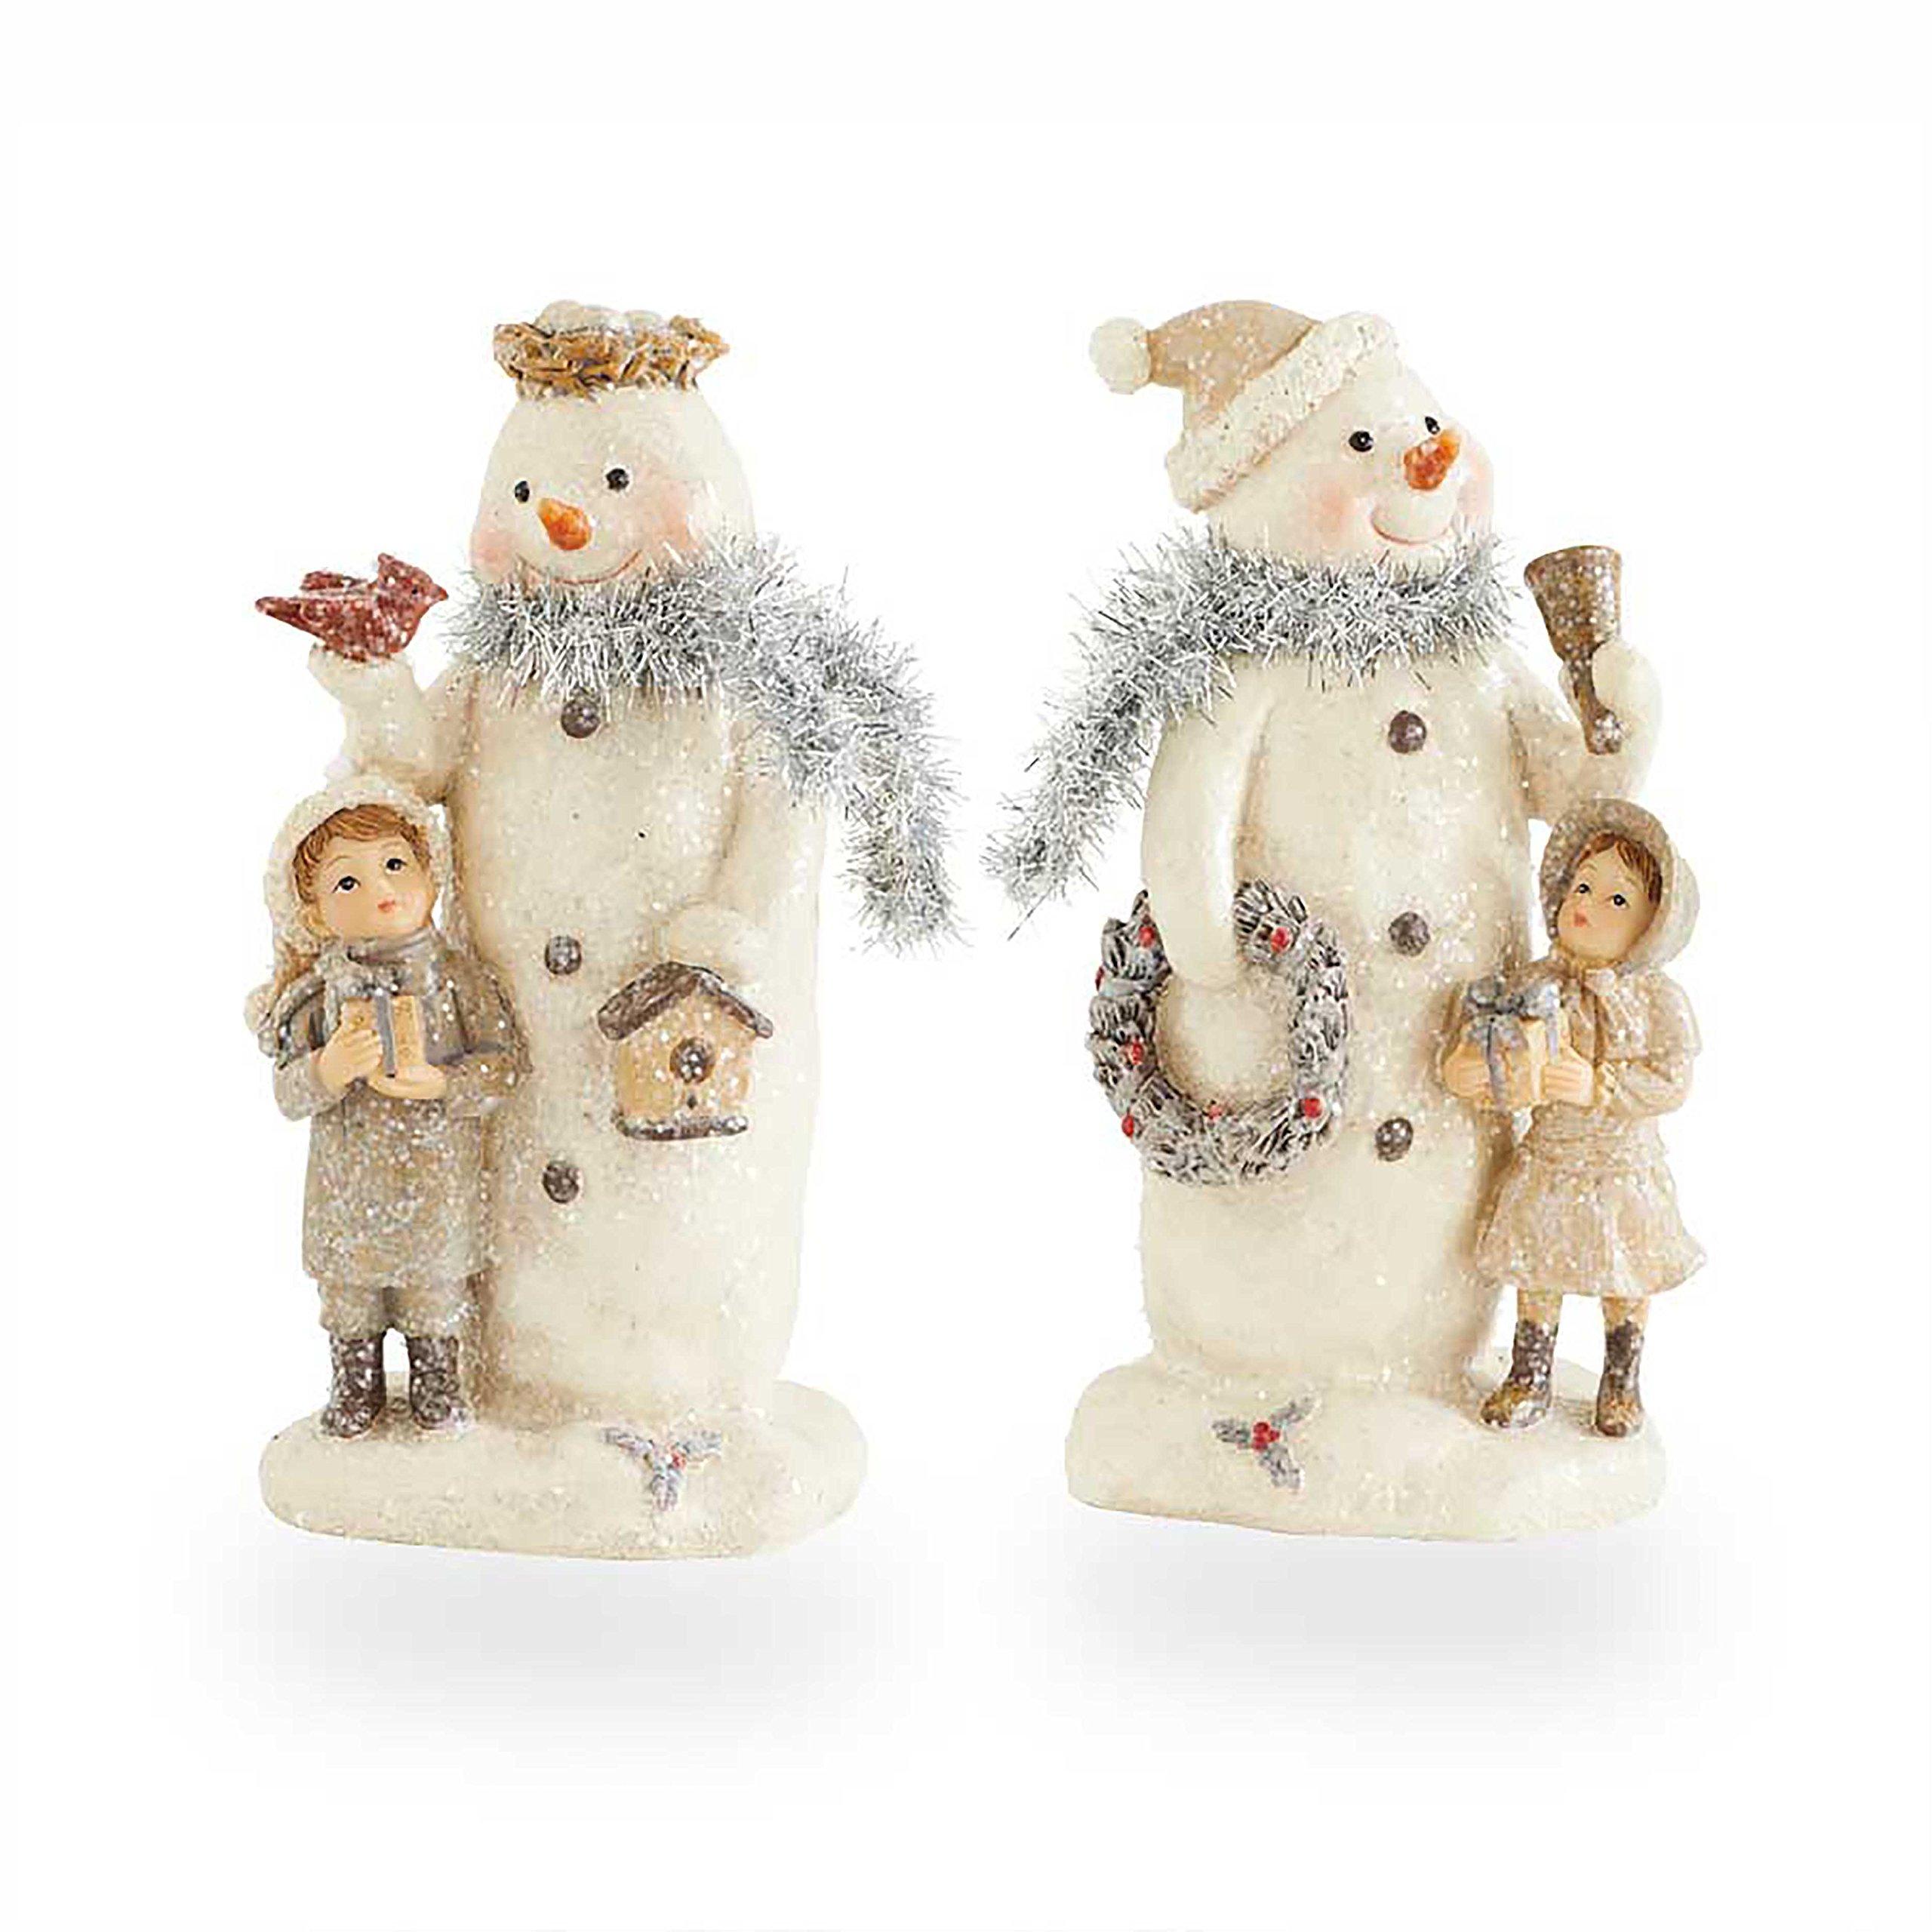 K&K Interiors Vintage Glitter Snowmen with Children Figurines, Resin Tabletop Decor, Set of 2, 7.5 Inch